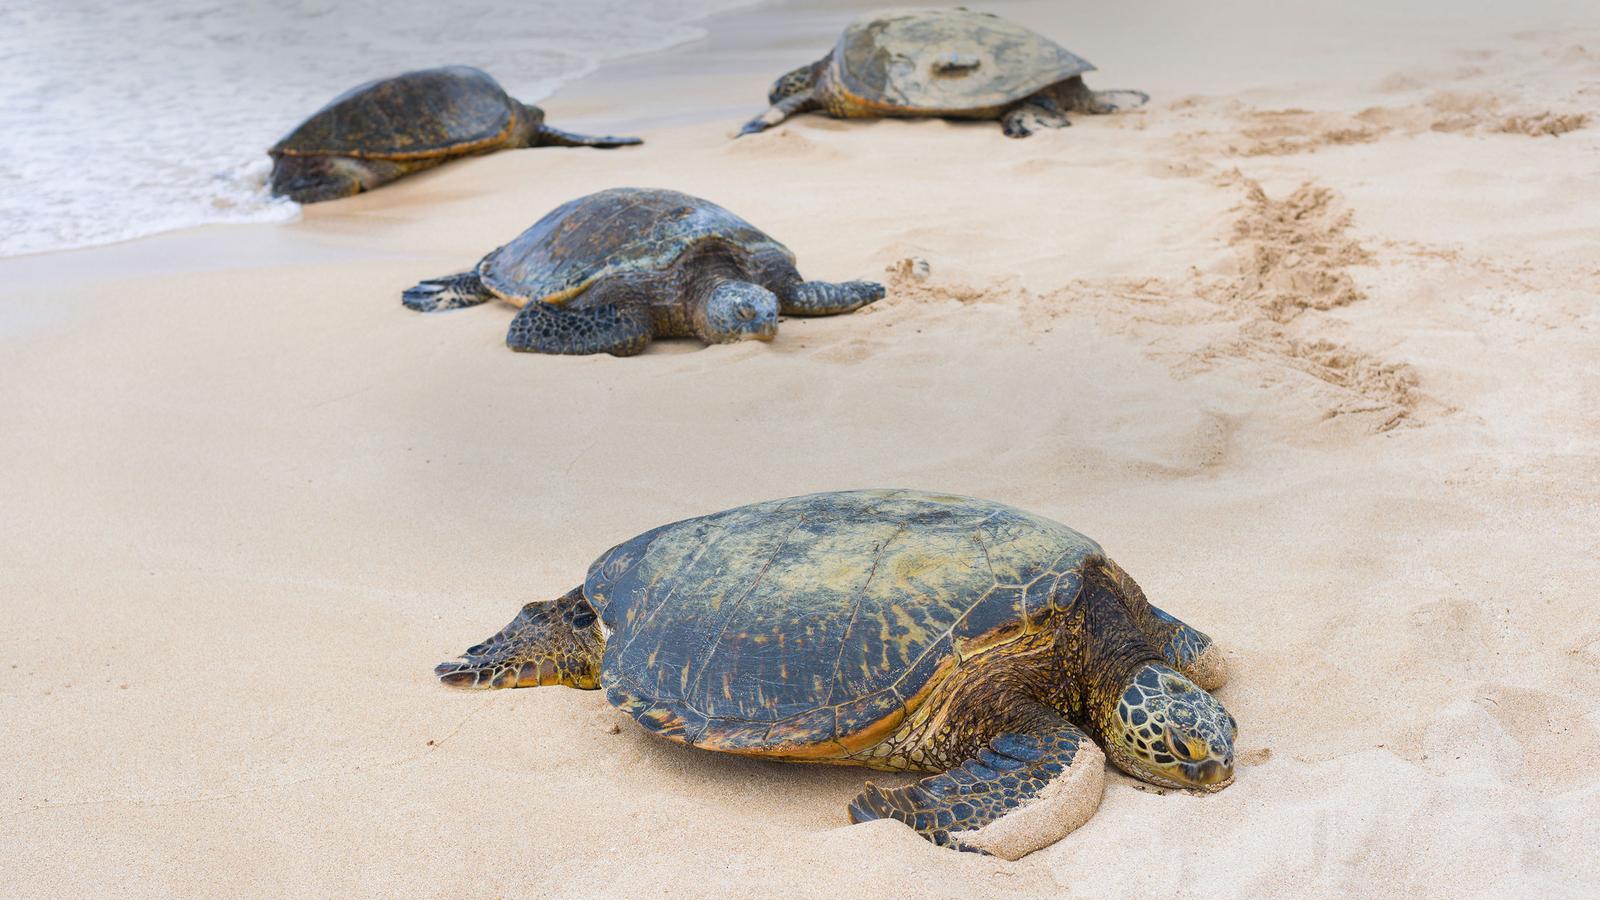 Giant turtles come ashore during nesting season